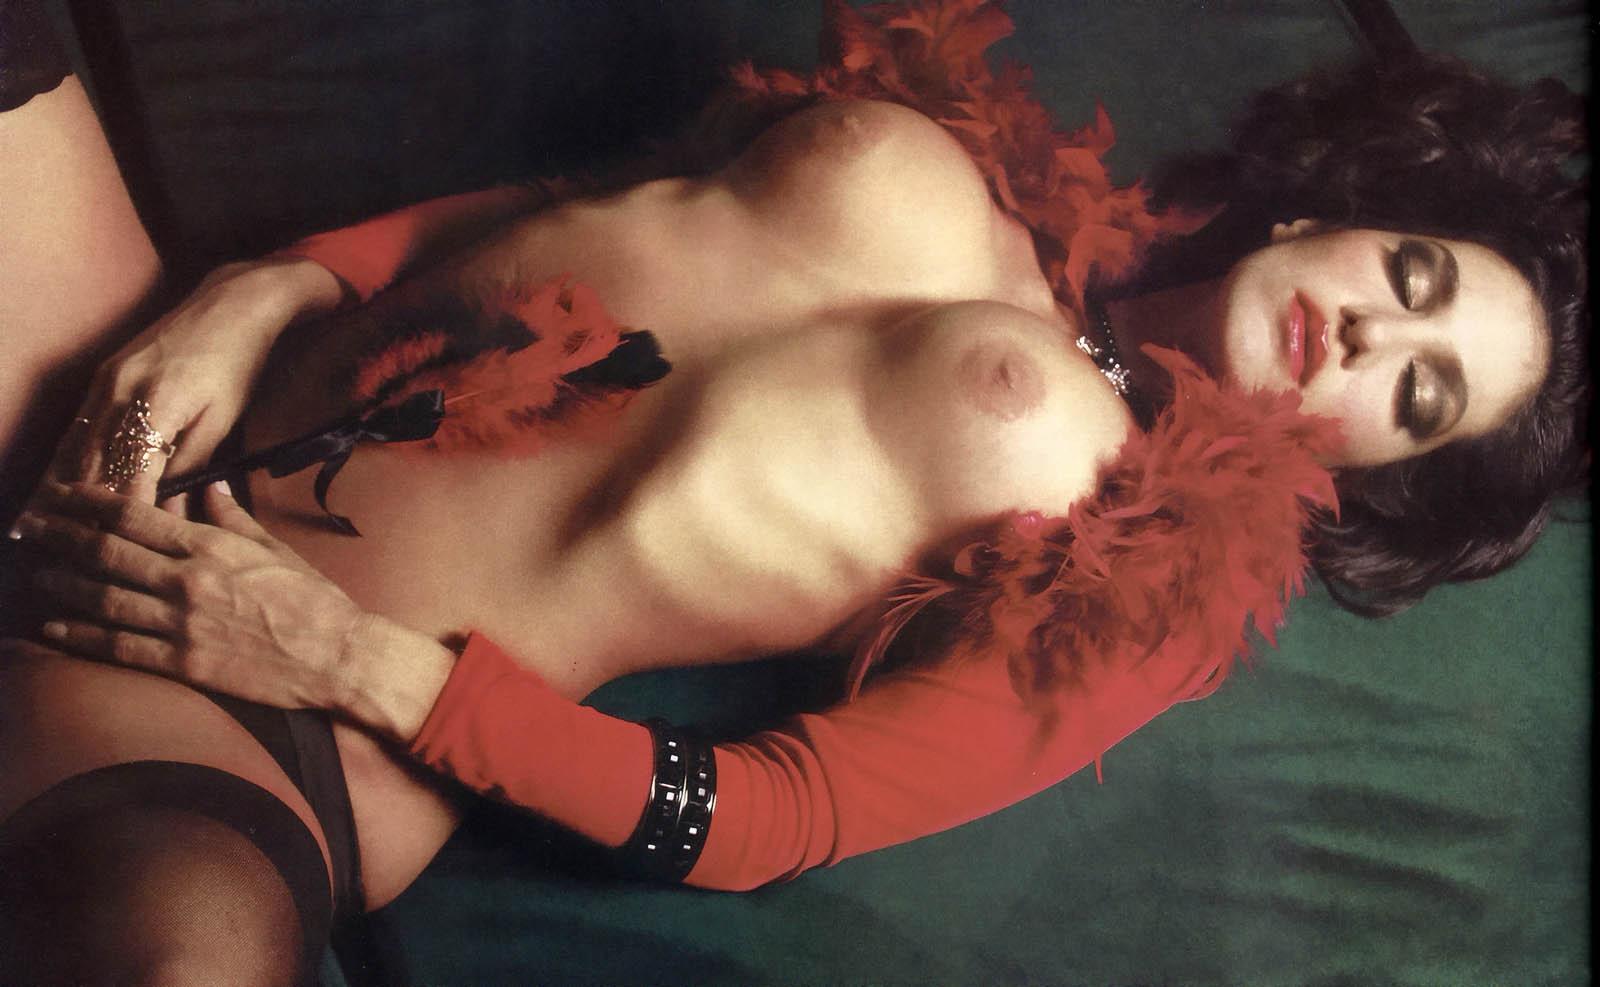 http://4.bp.blogspot.com/_2DrwKI9DpLs/TRqVi3SAMhI/AAAAAAAAAr4/oJYaTZpiyeI/s1600/88251_Silvina-Escudero-02L1-Playboy-jun-2009_123_468lo.jpg